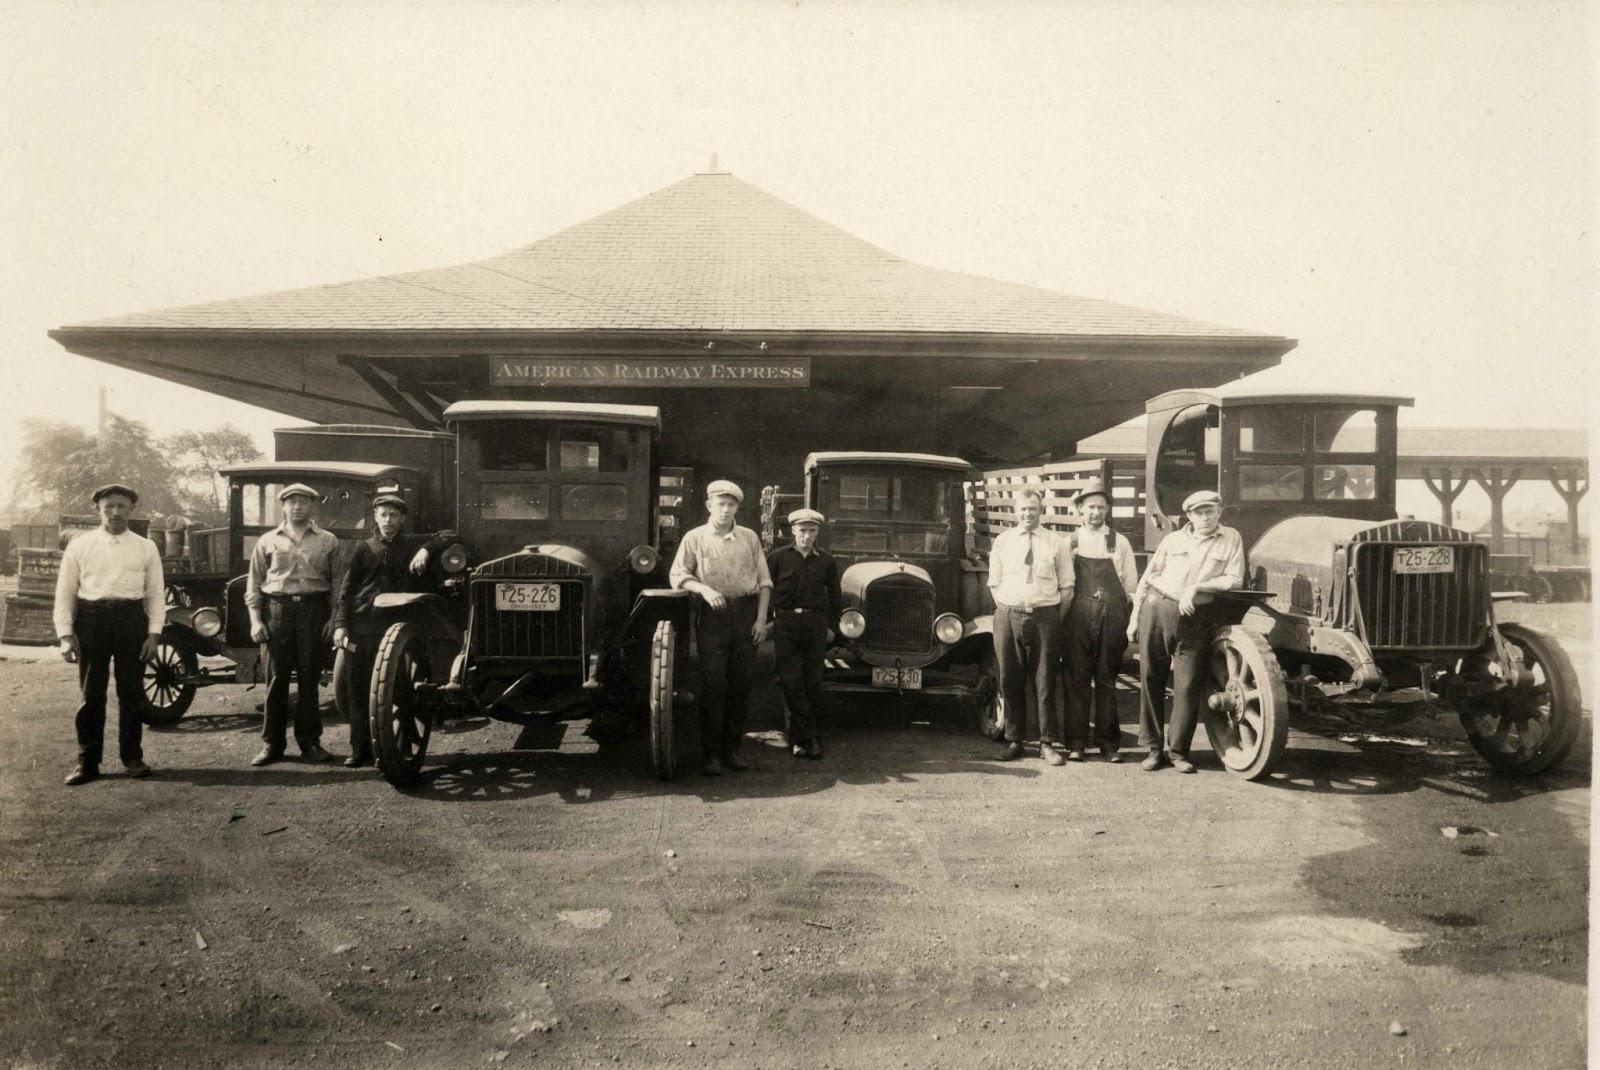 american railway company